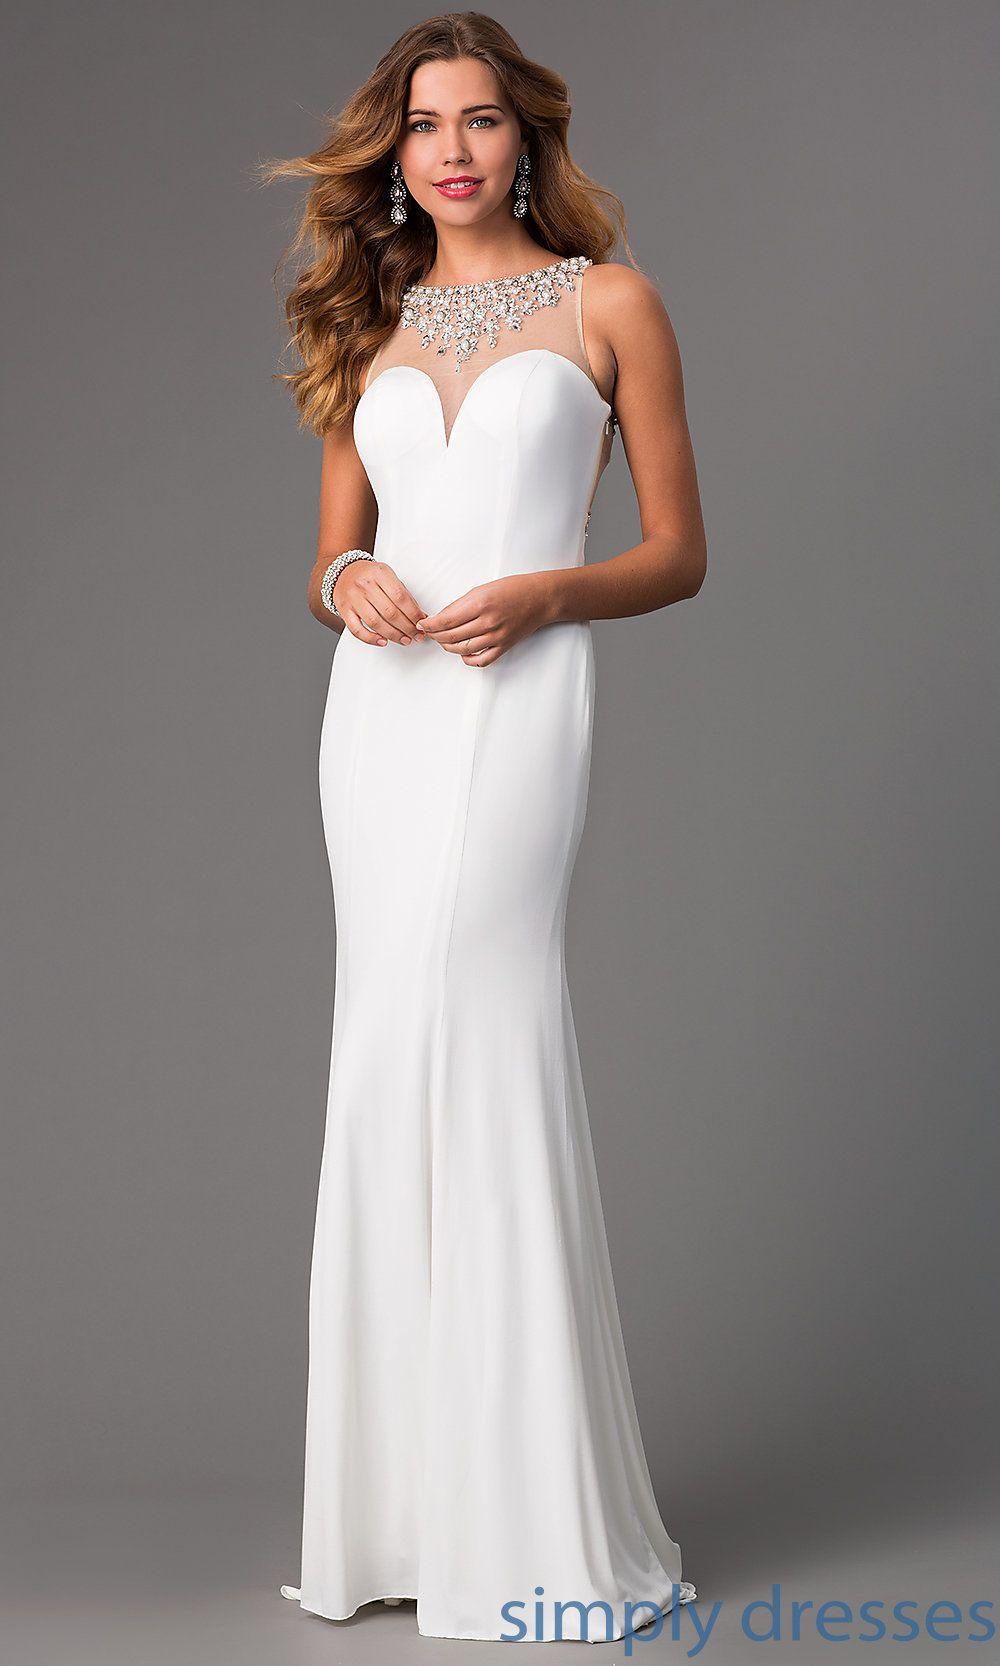 Homecoming dresses formal prom dresses evening wear jojvn